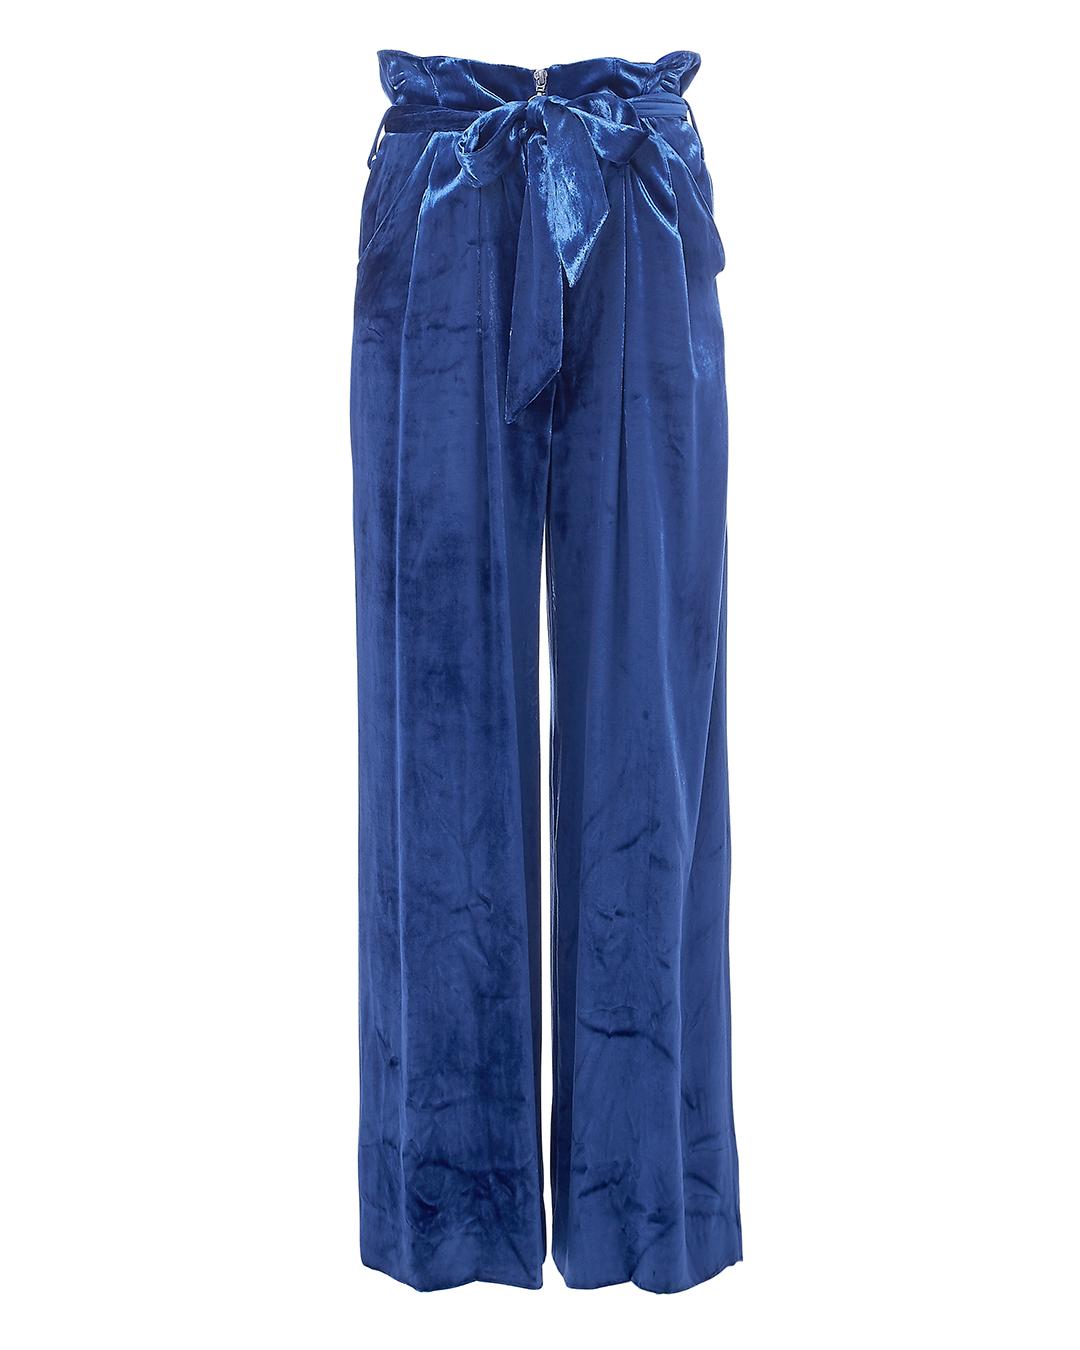 EXCLUSIVE FOR INTERMIX Claudia Velvet Pants